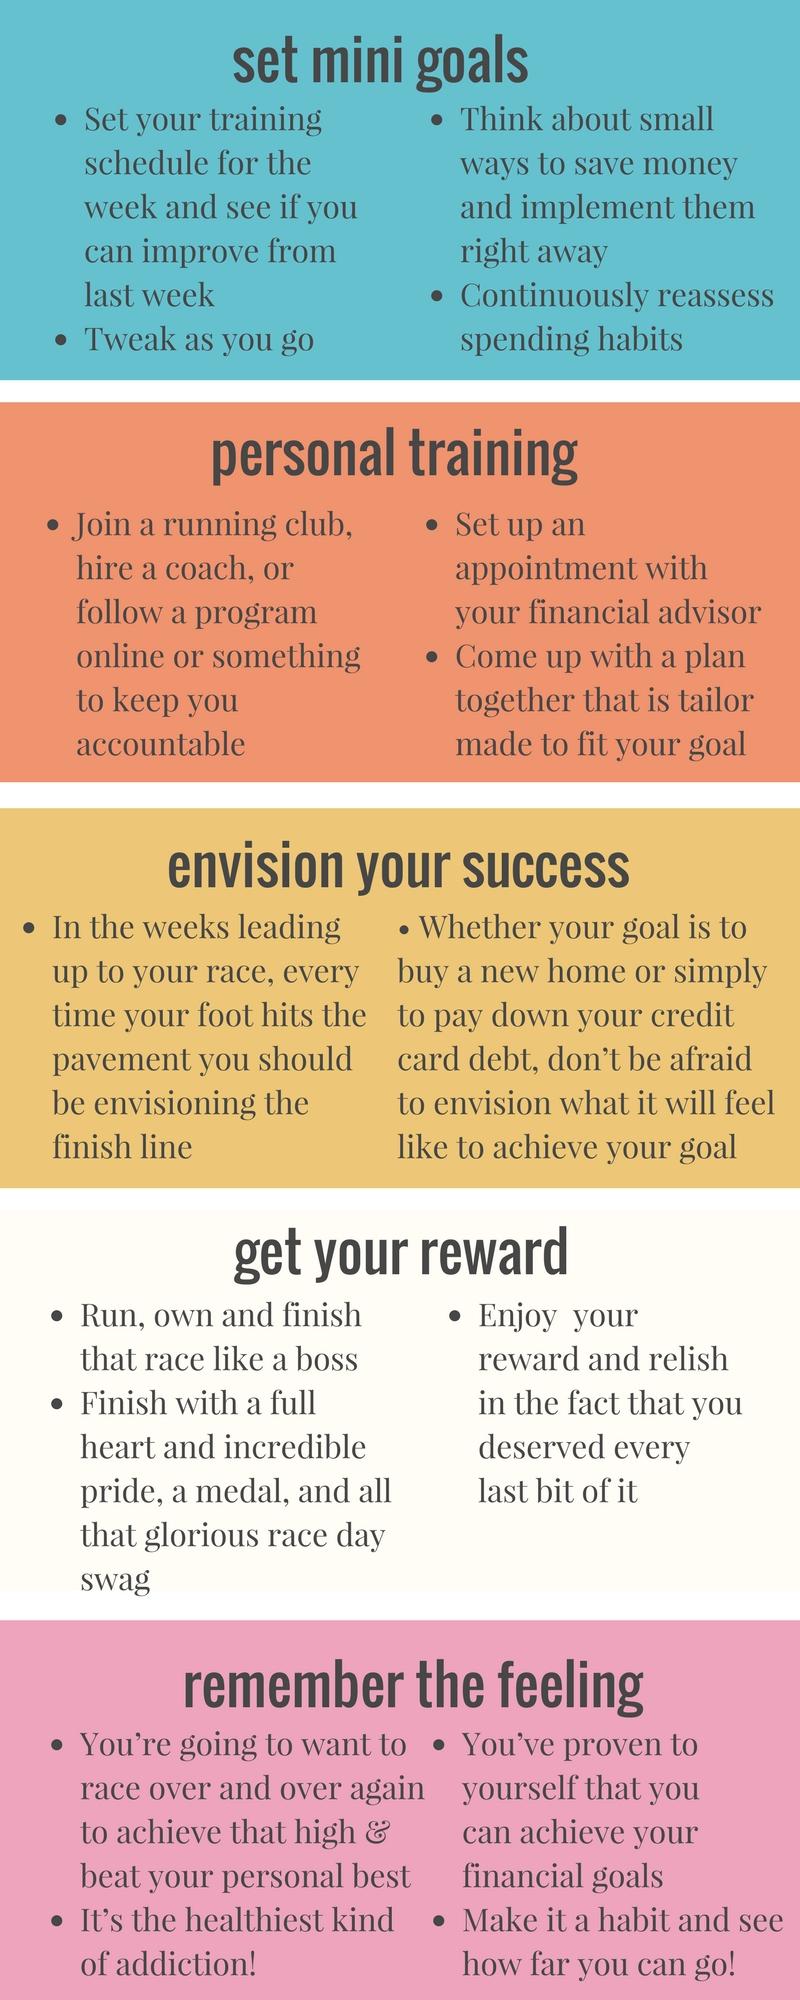 Set Goals Financial Fitness Servus Credit Union